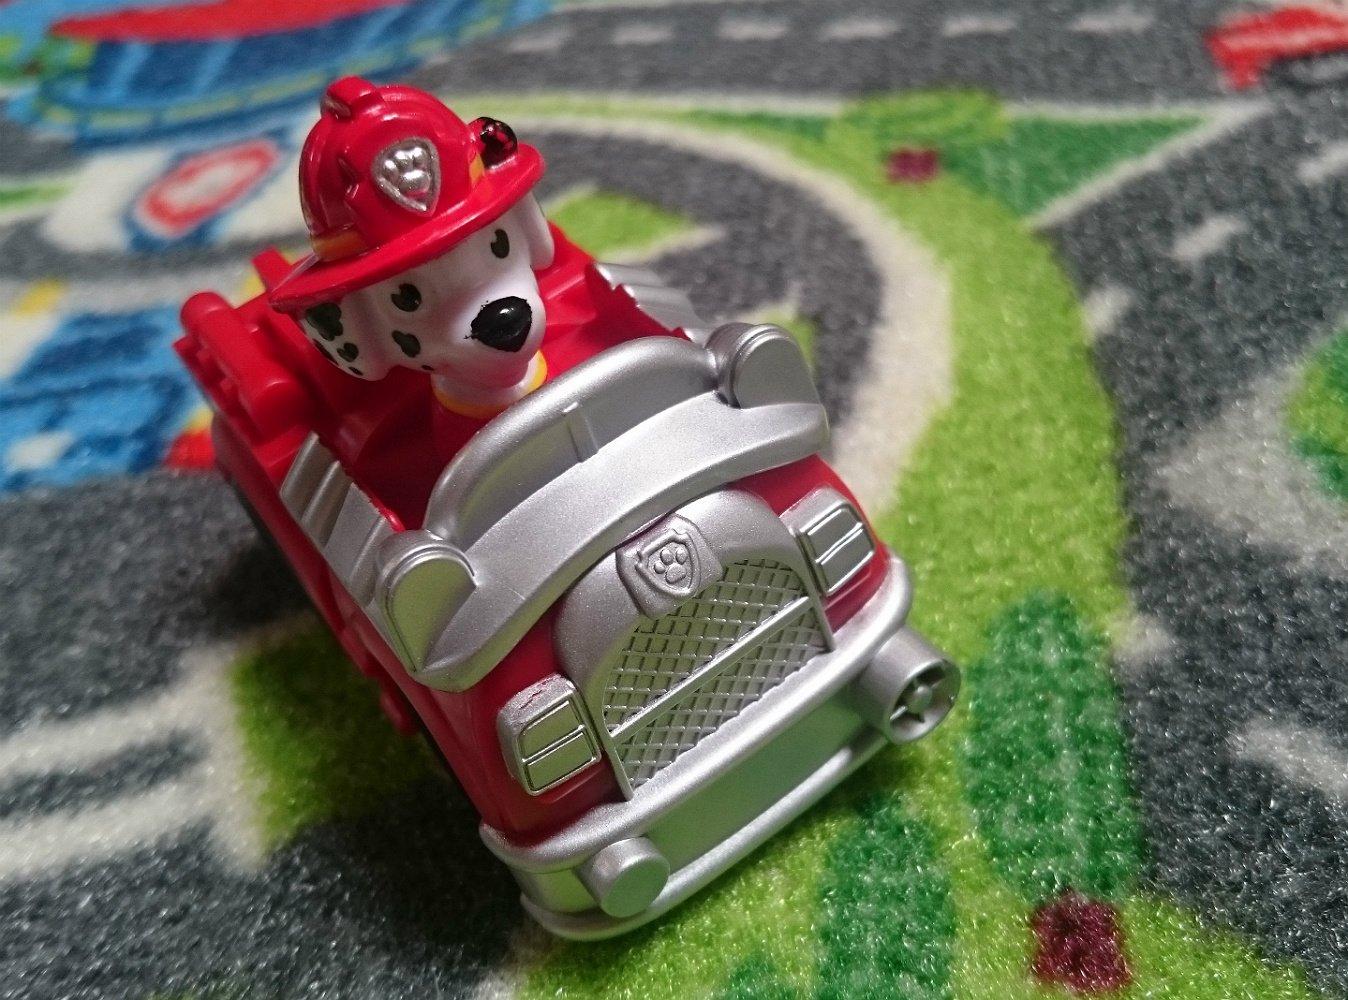 32x44 32x44 G.A Gertmenian /& Sons 31054 Paw Patrol Toys Rug 2017 HD Marshall Fire Truck Adventure Bay Kids Game Play Mat Gertmenian